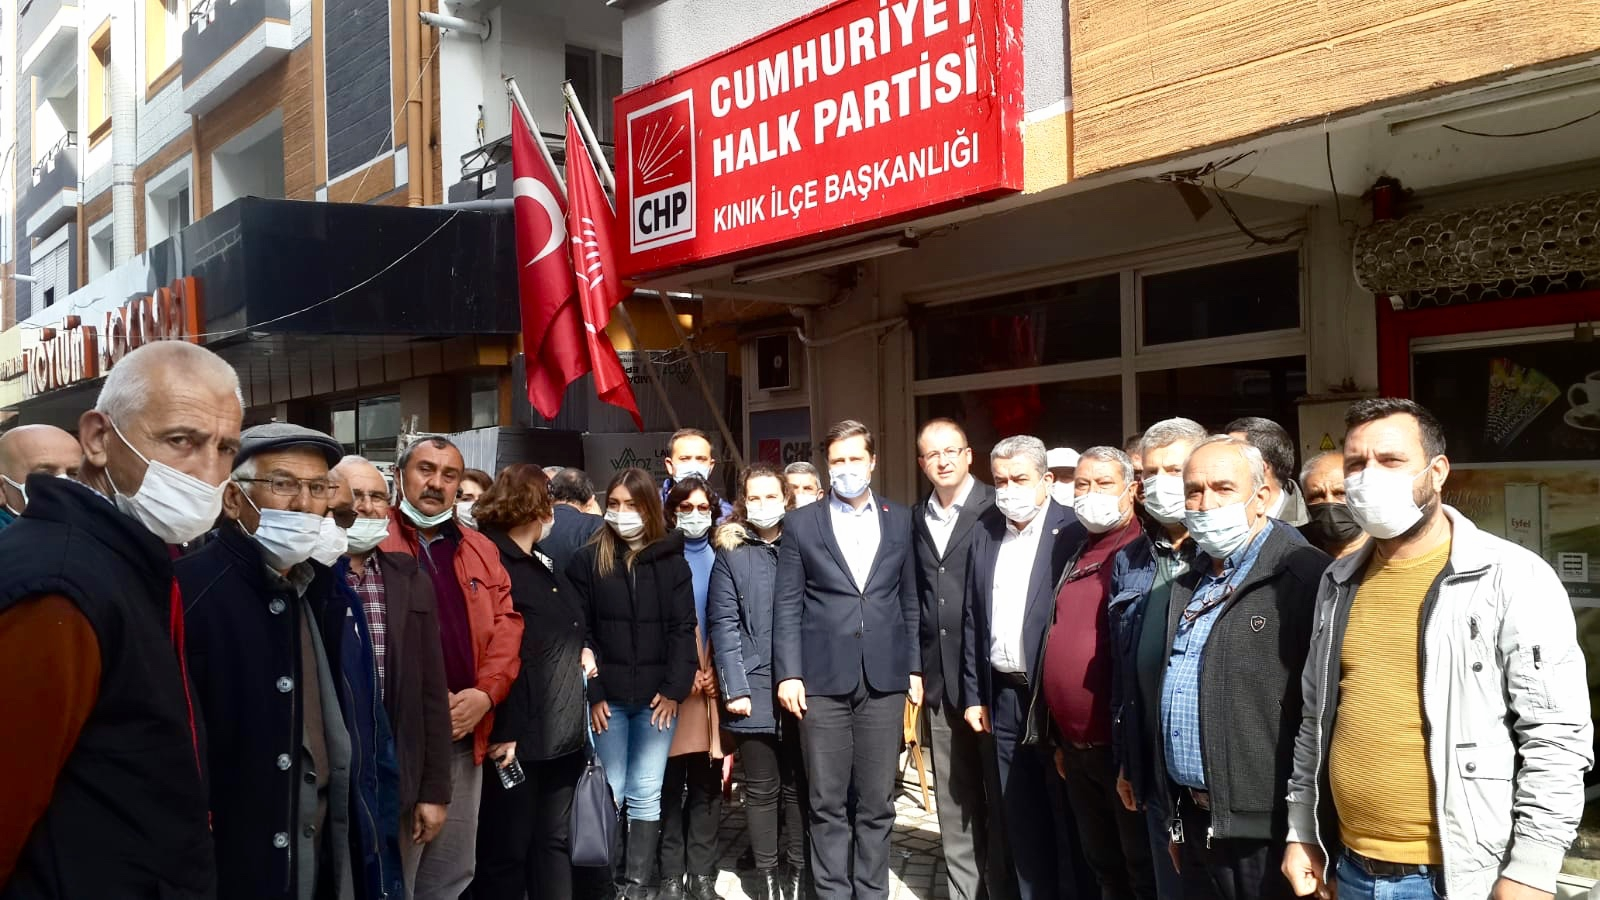 CHP İZMİR'DEN BAKIRÇAY SEFERBERLİĞİ